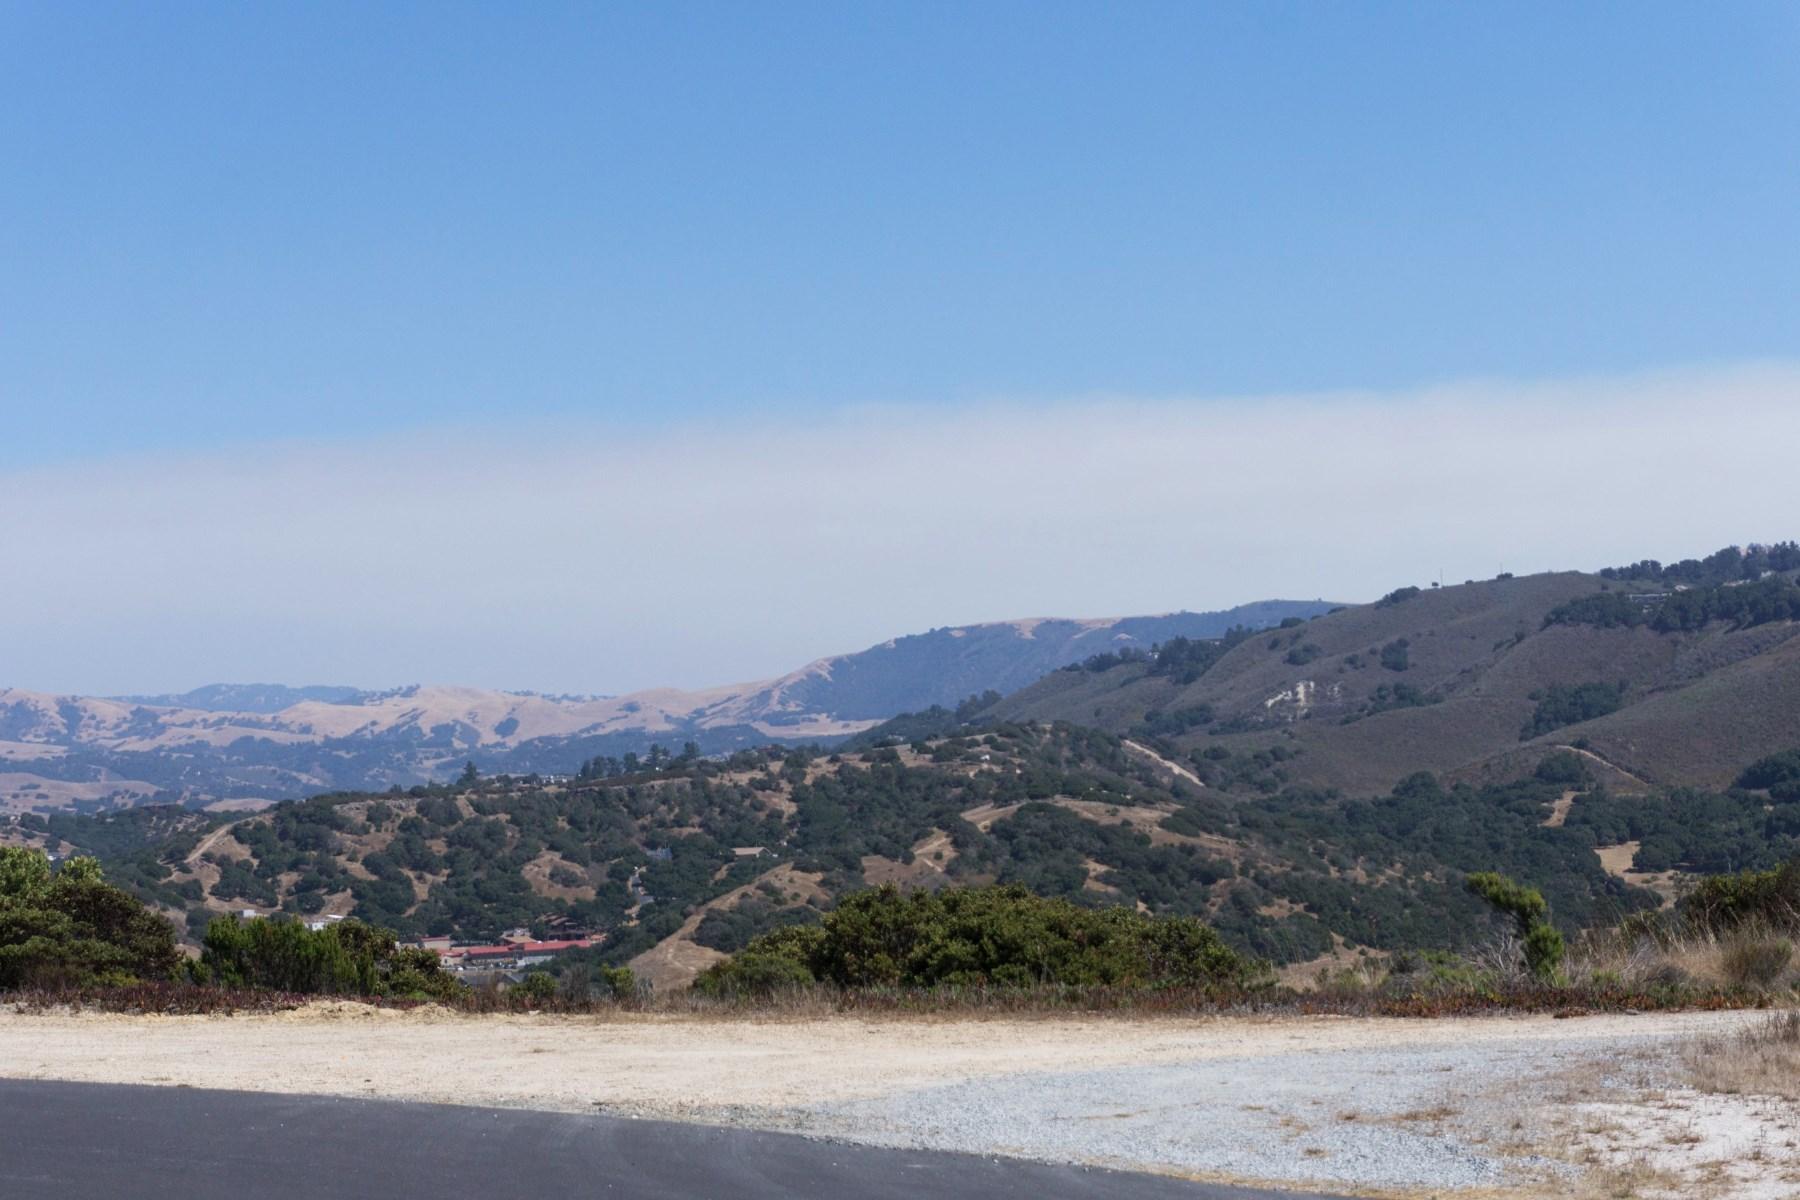 Land for Sale at Fabulous View Lot 502 Estrella Doro Monterey, California, 93940 United States